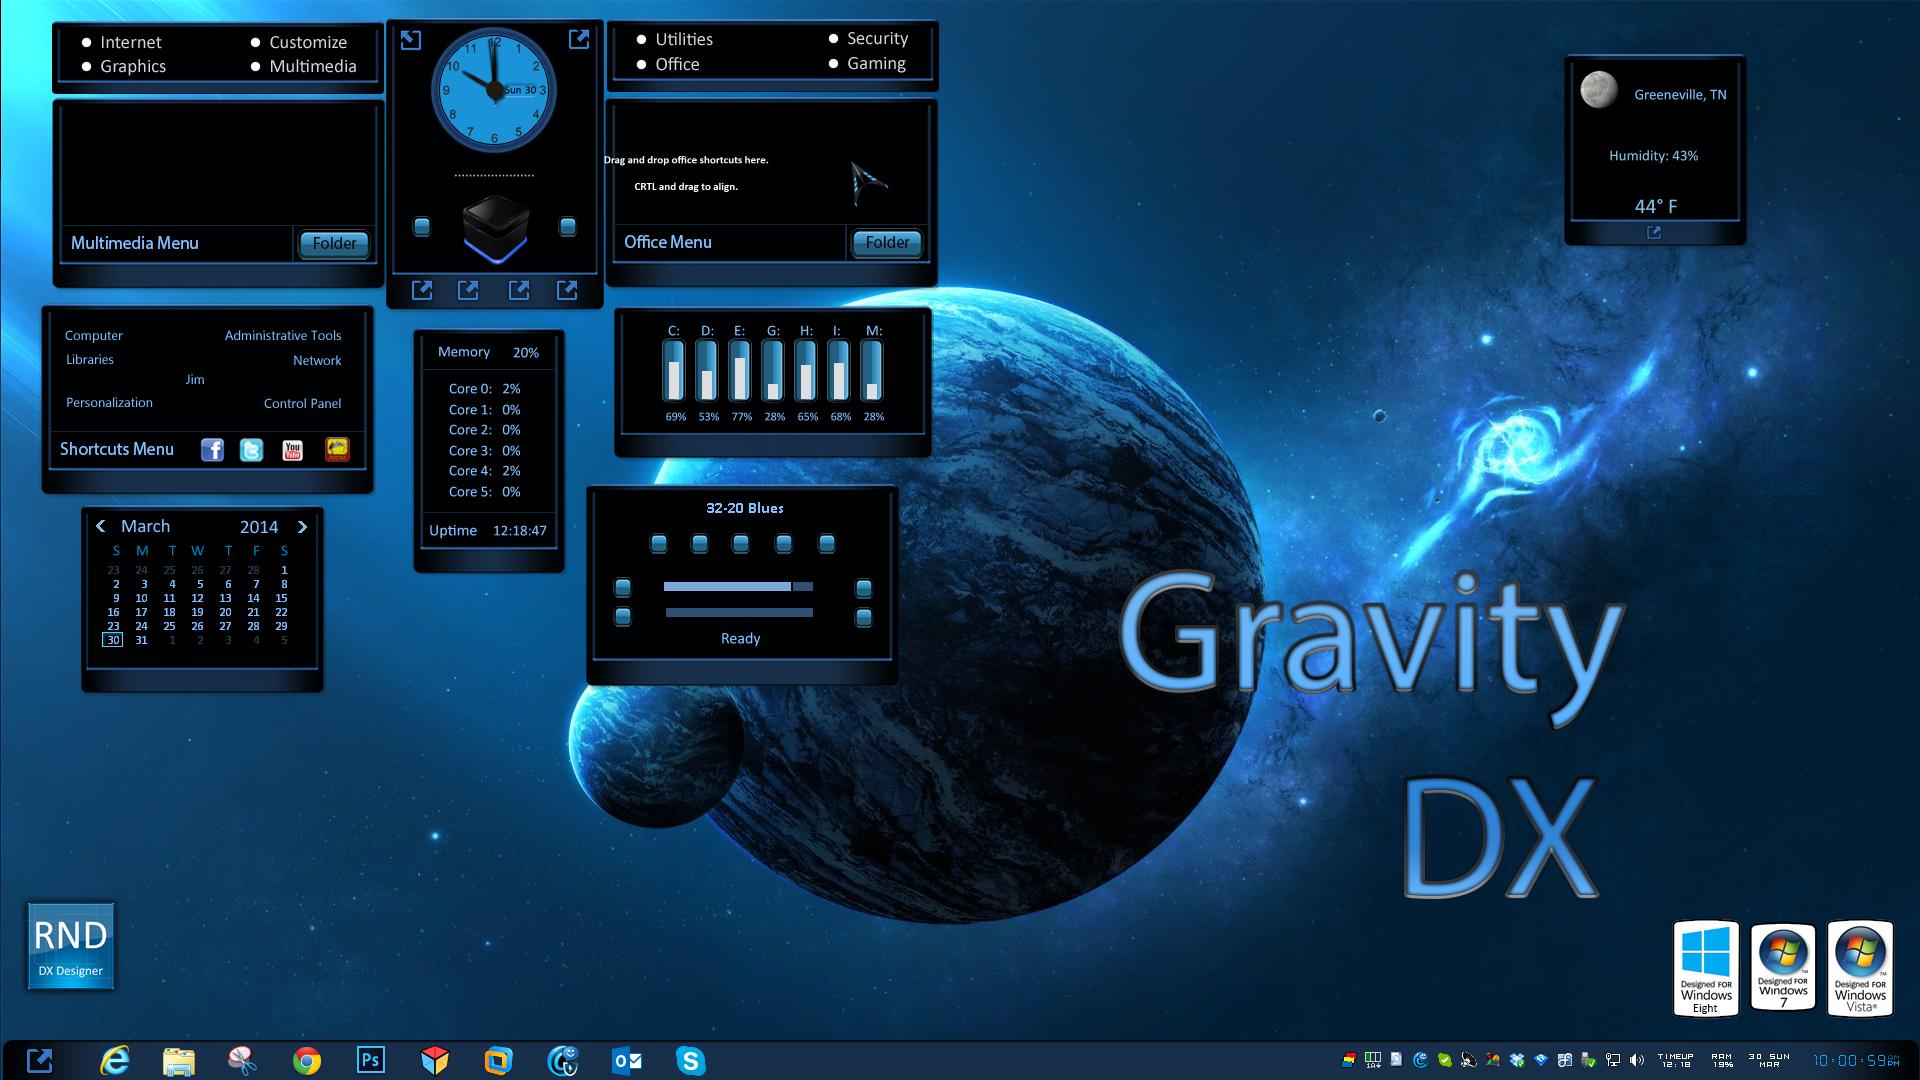 Gravity DX